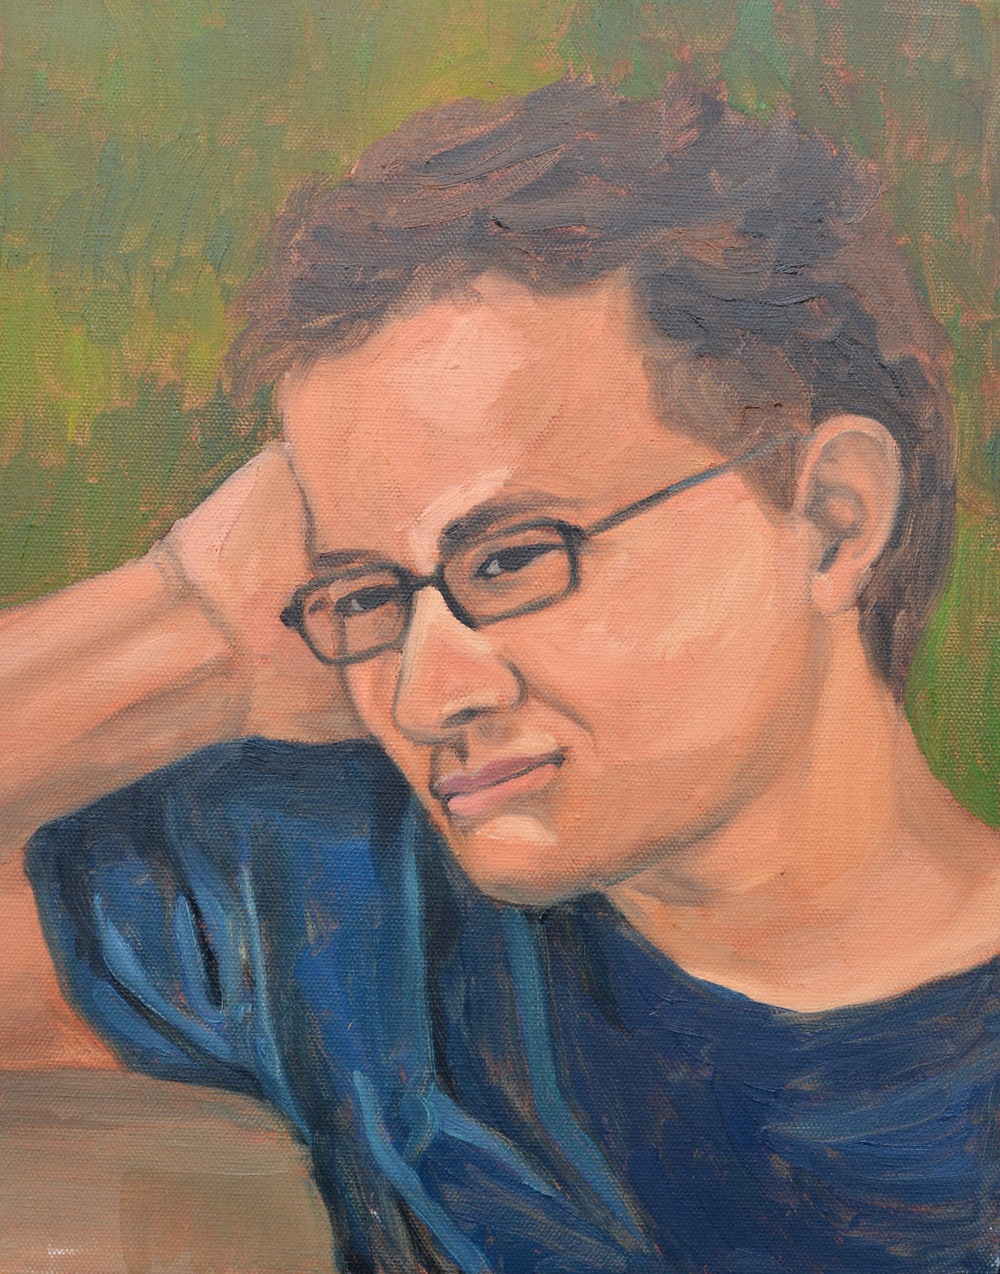 "Tim, 11x14"", oil on canvas, 2011"